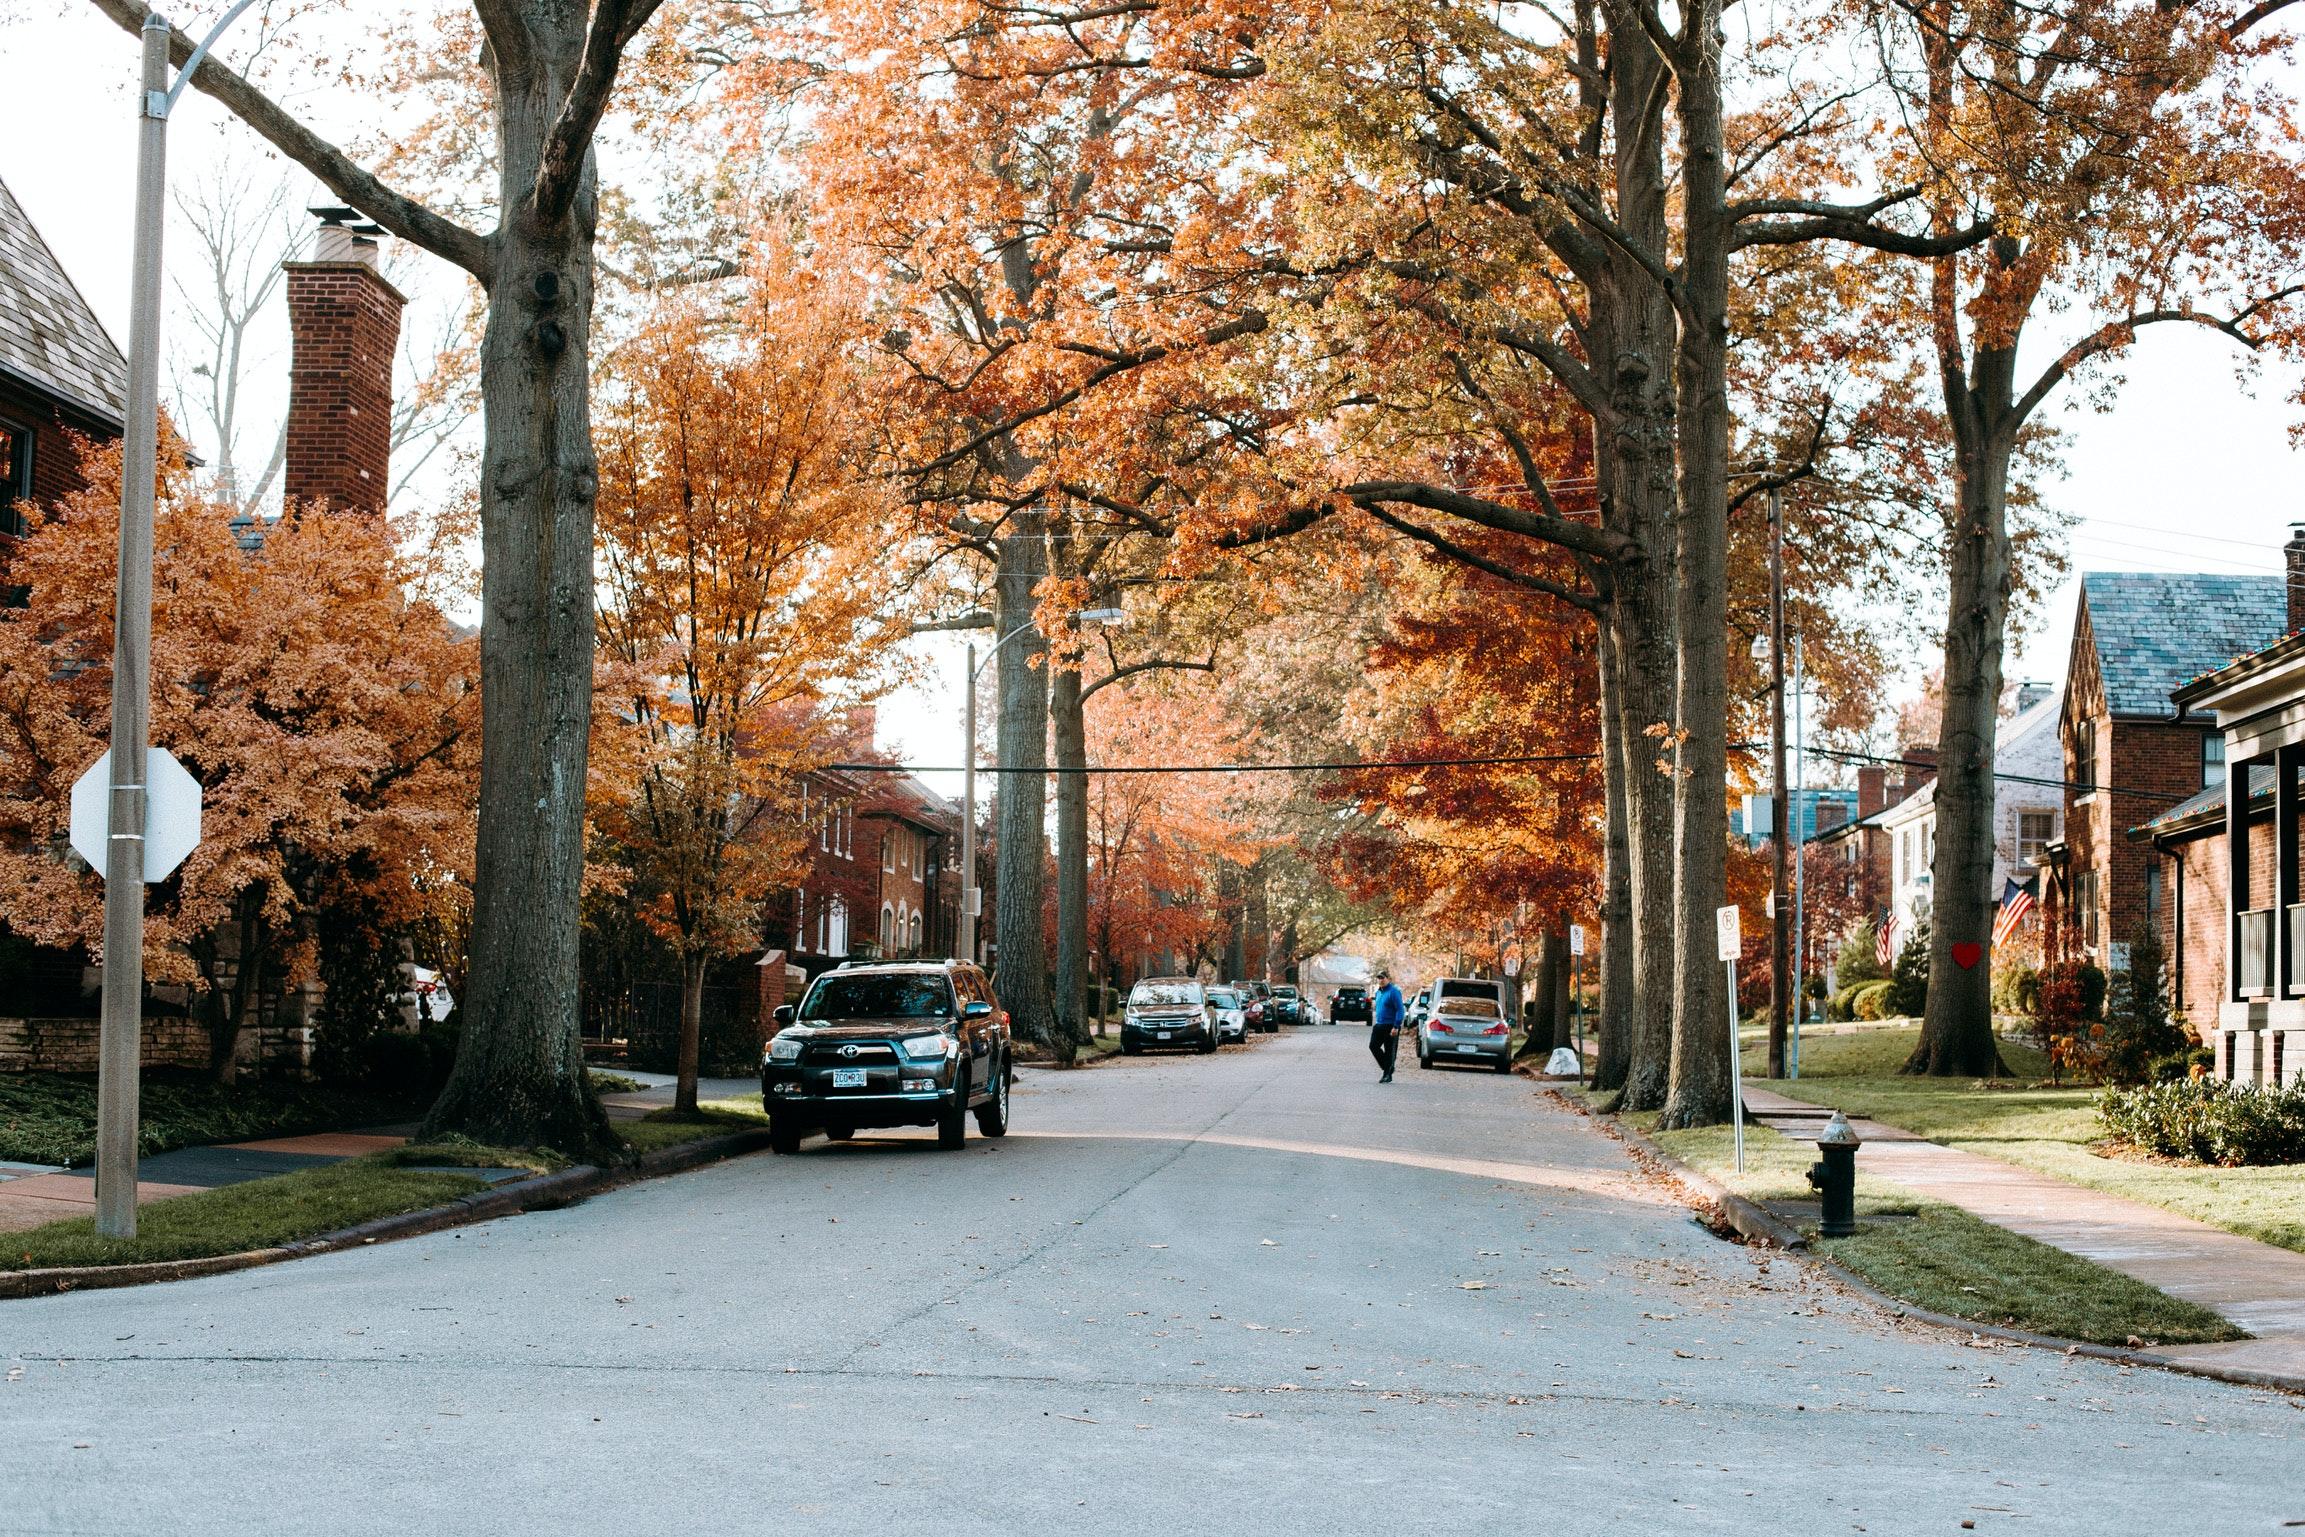 street lined trees